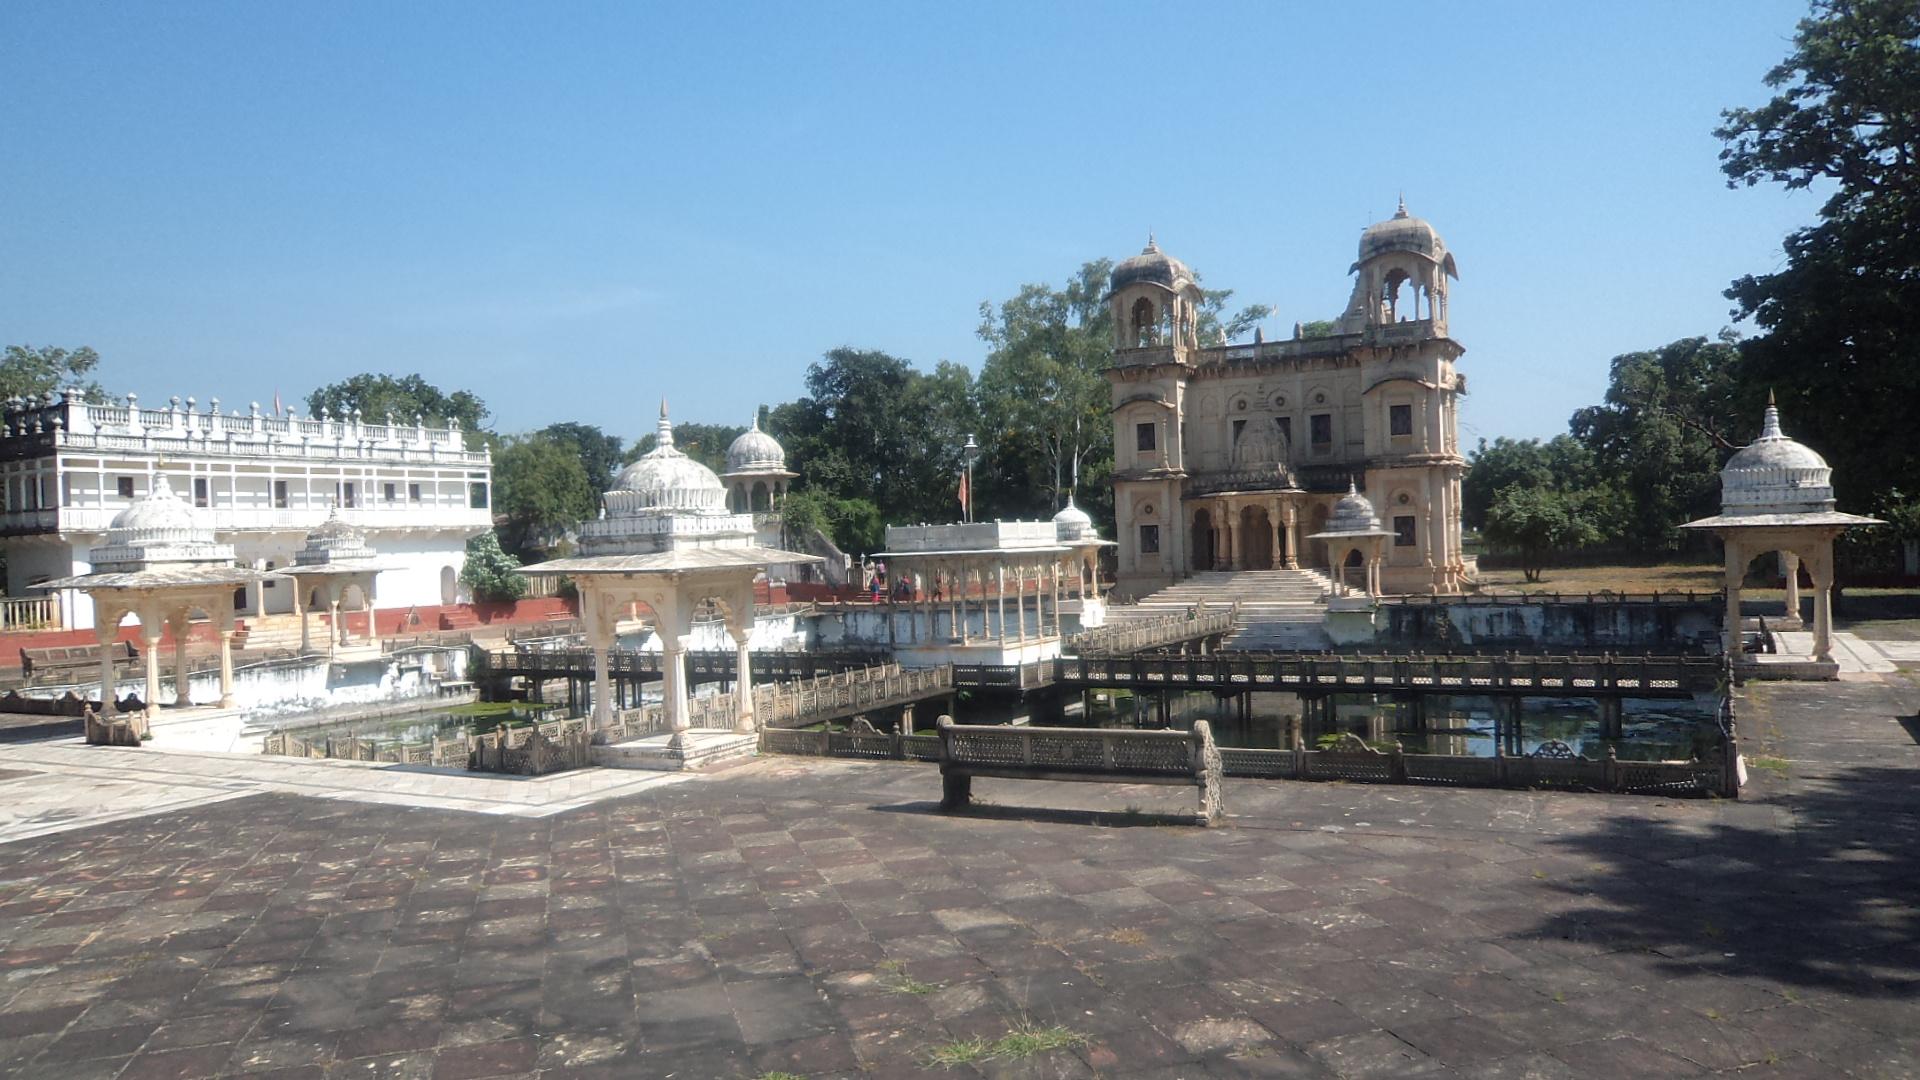 http://www.getbookcab.com/Admin/images/Shivpuri.jpg